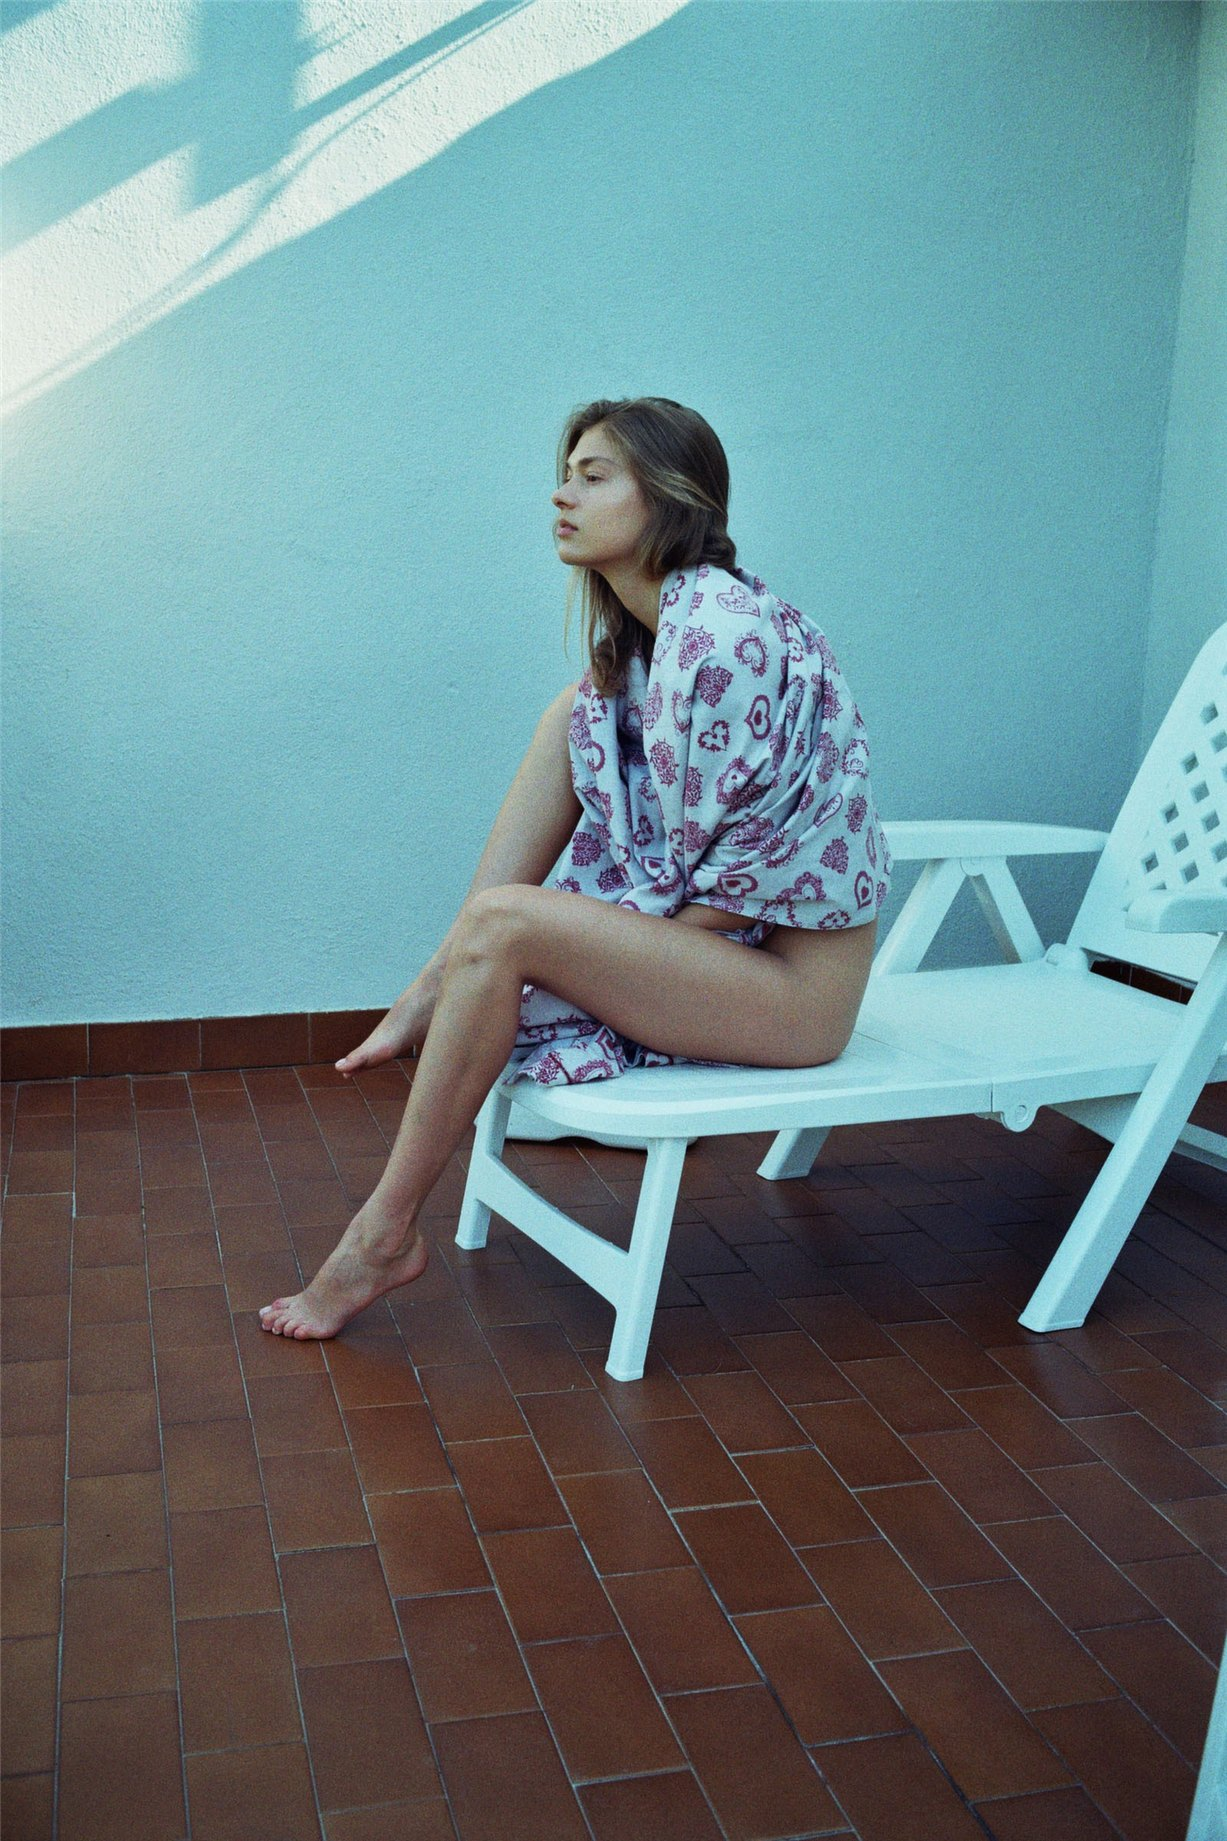 На море с Машей Шакуровой / Masha Shakurova by Alessandro Casagrande